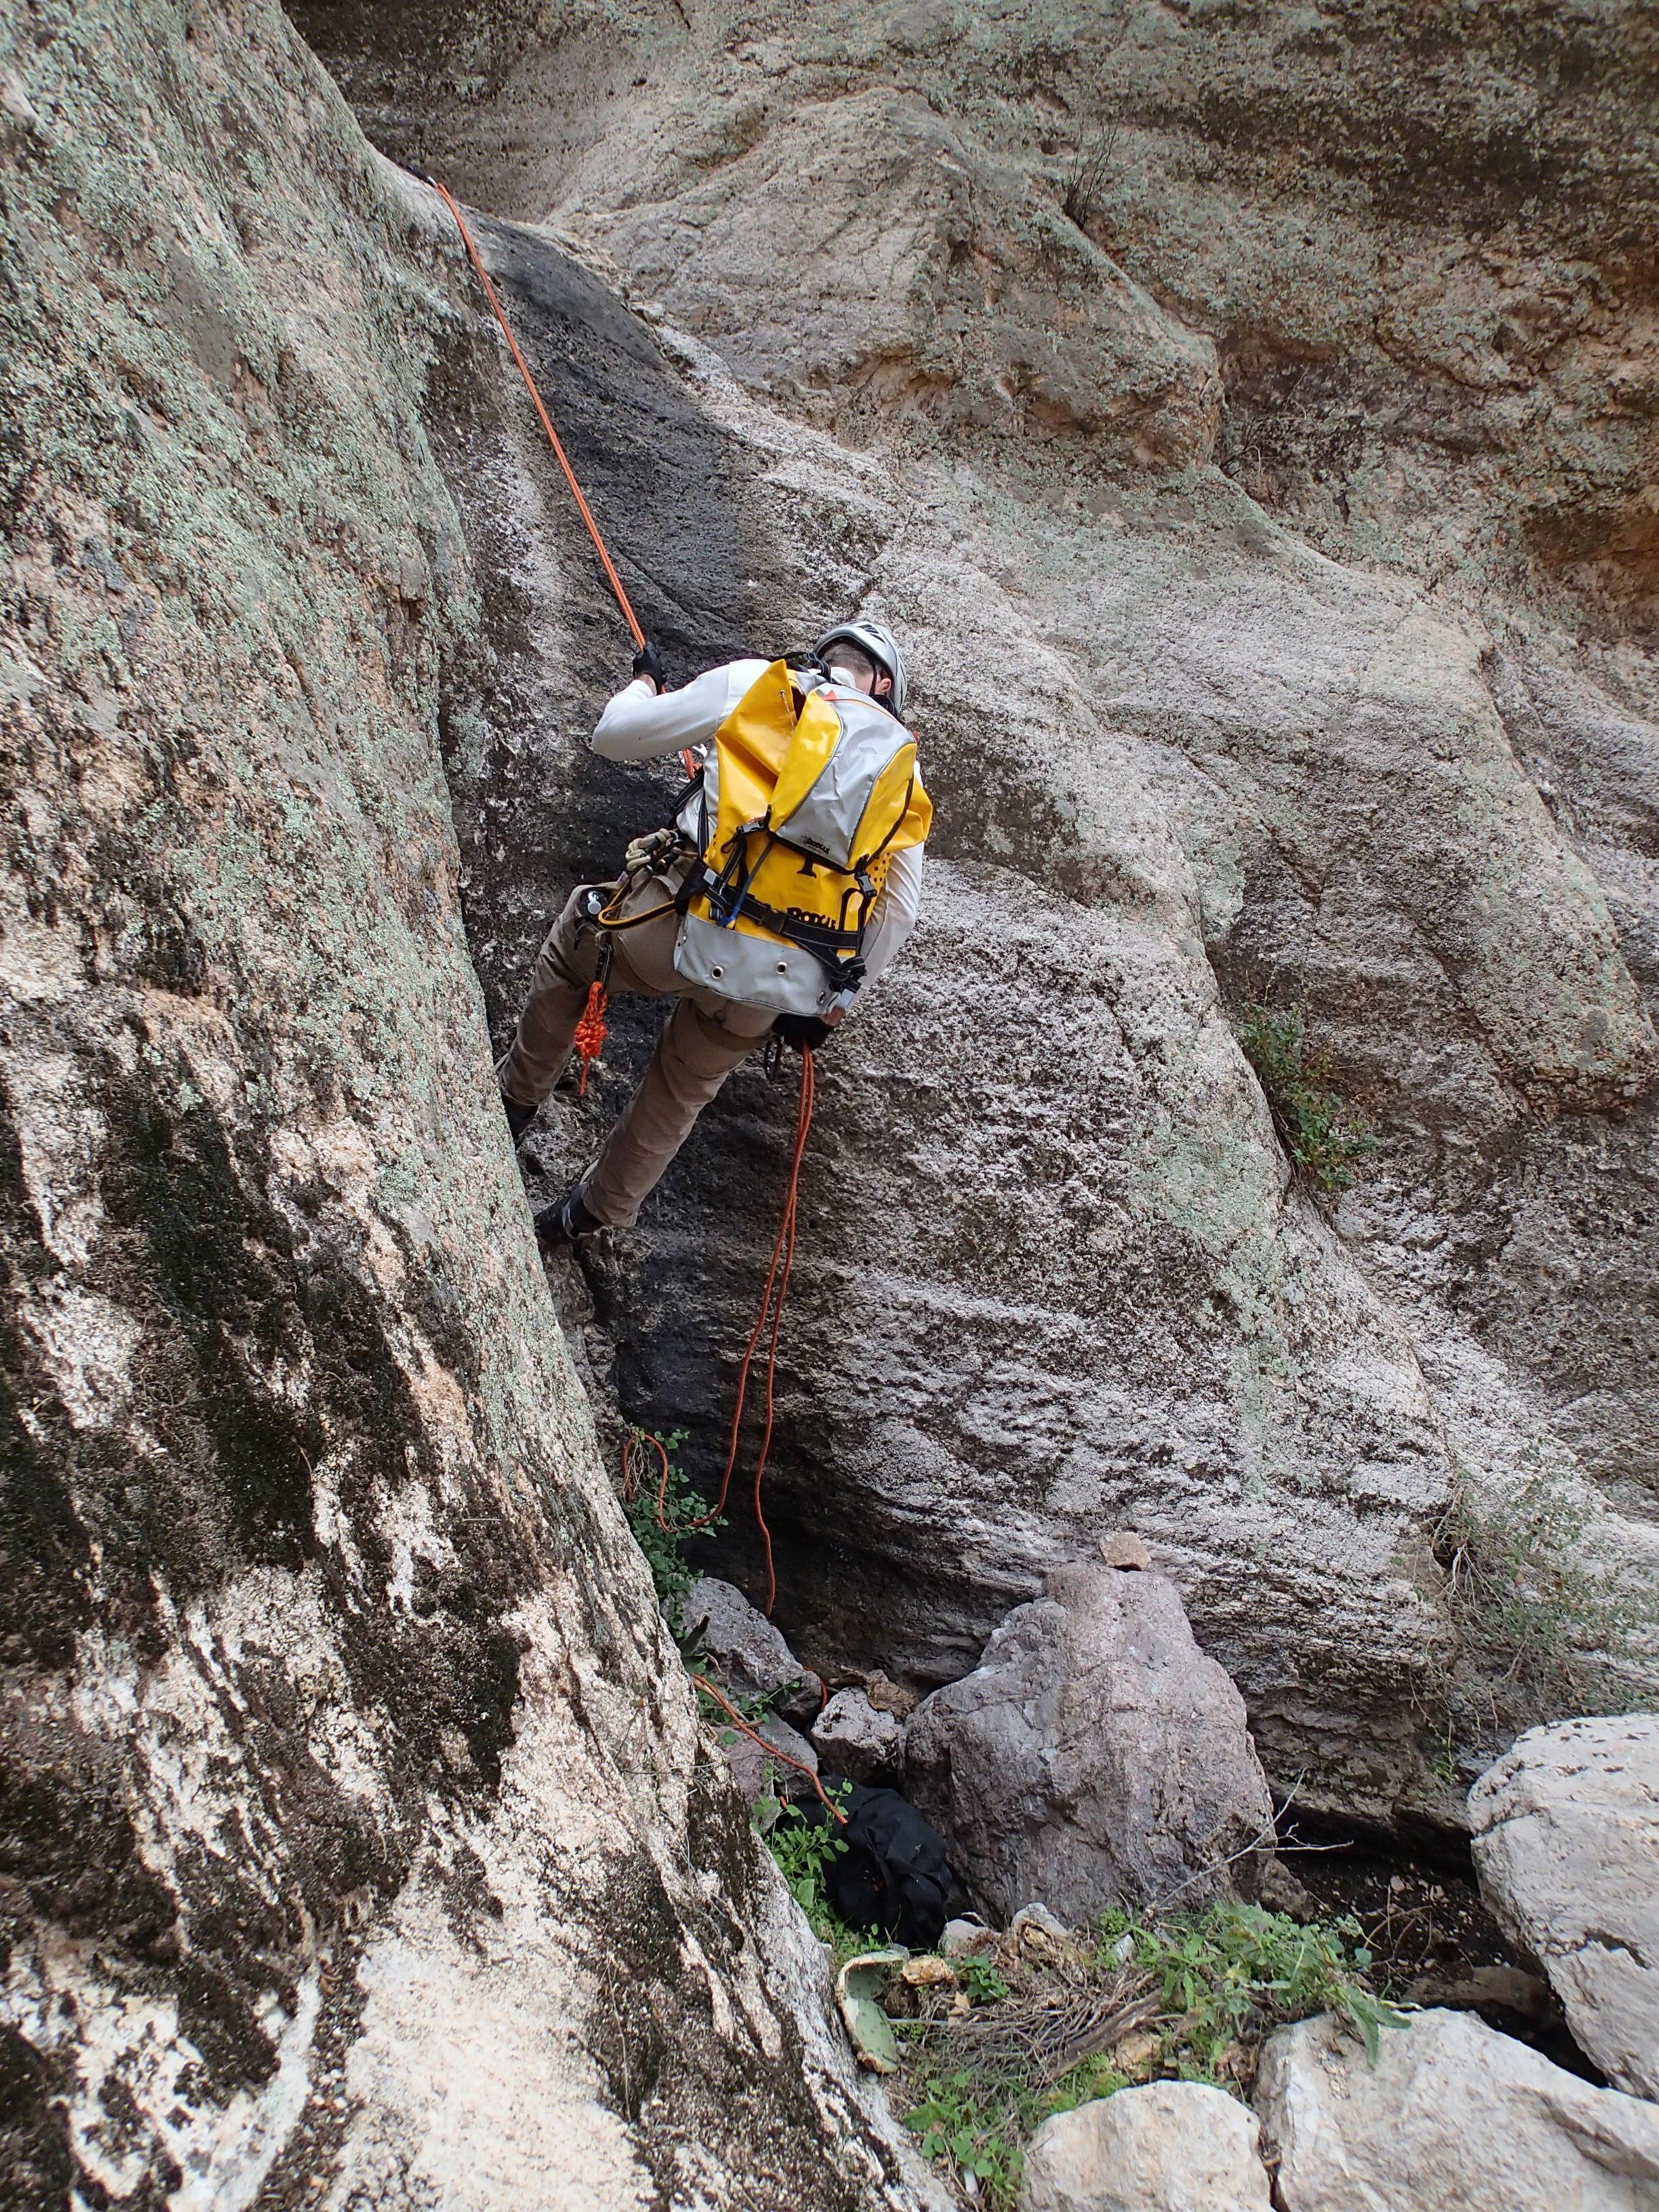 Hurler Canyon - Canyoneering, AZ